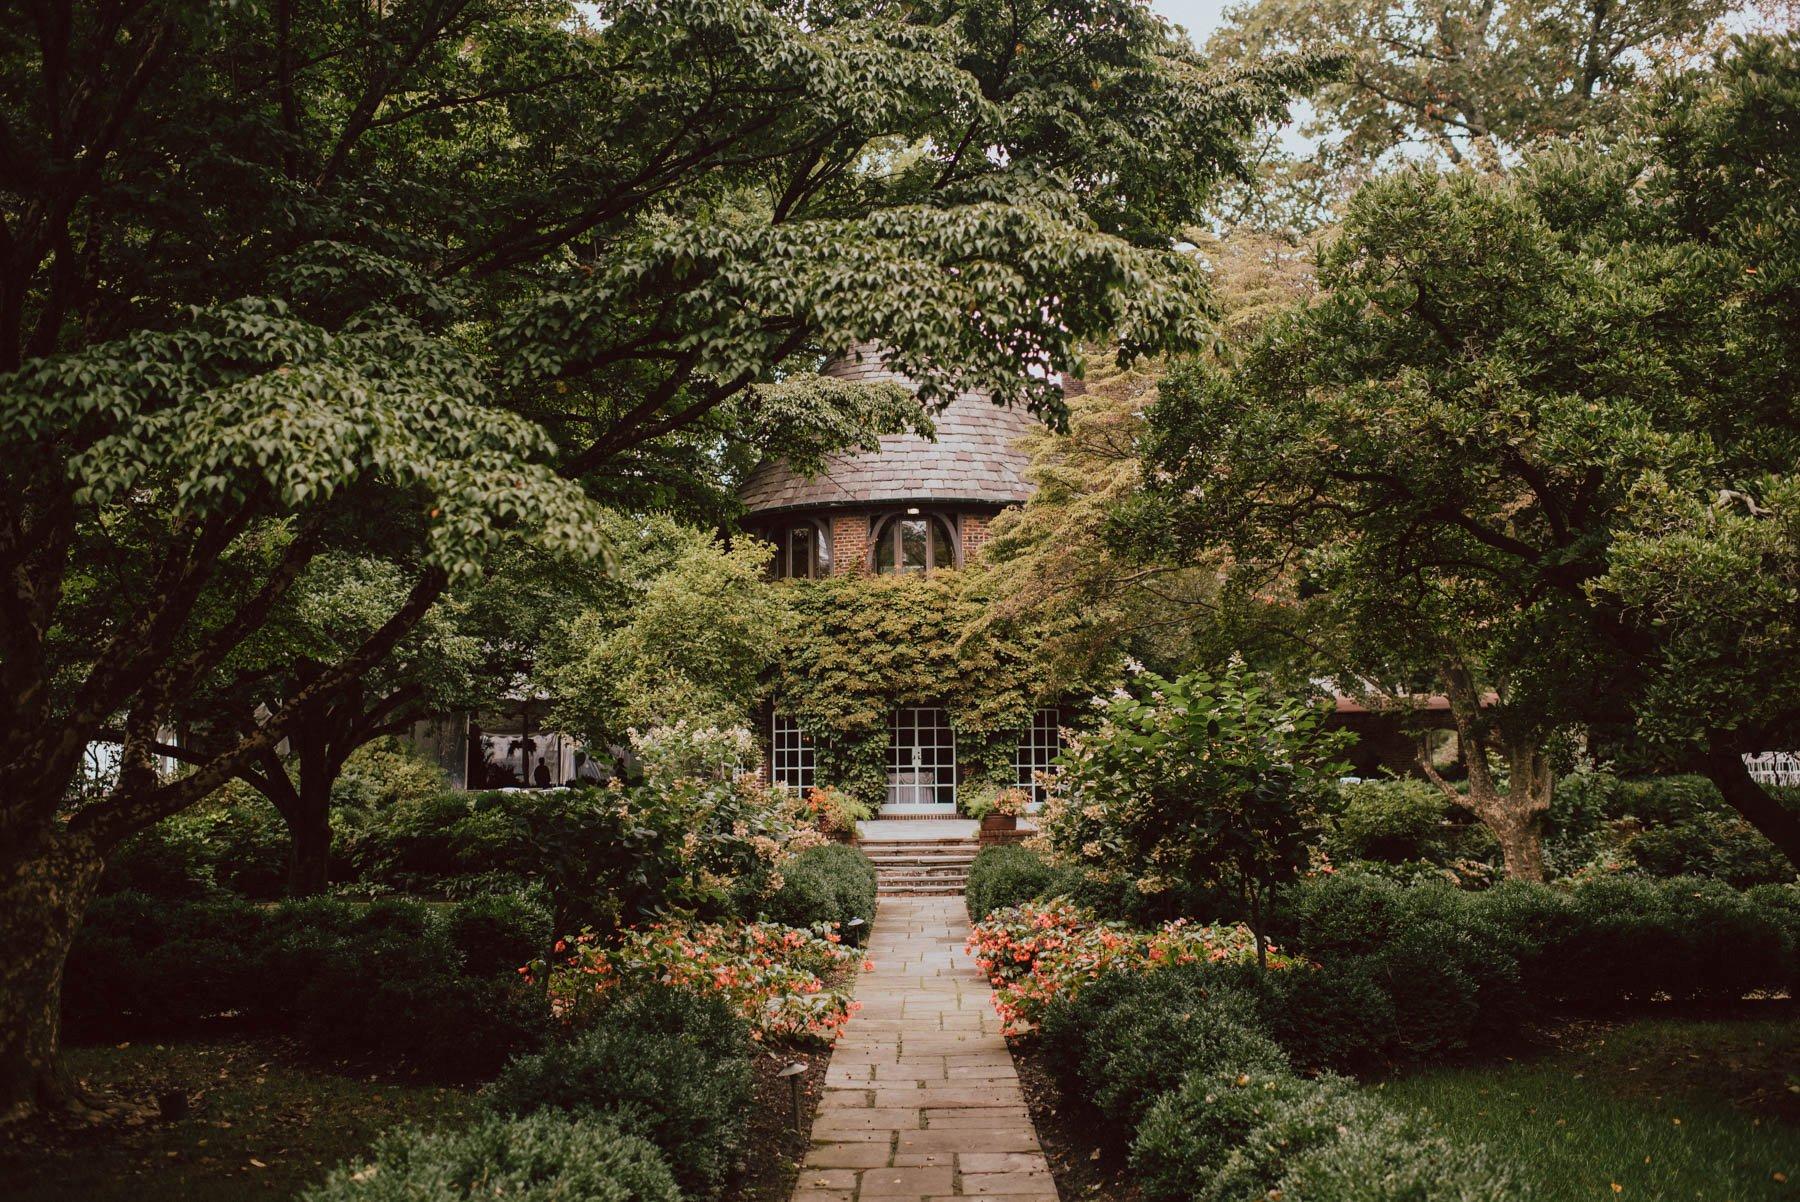 greenville-country-club-wedding-1.jpg